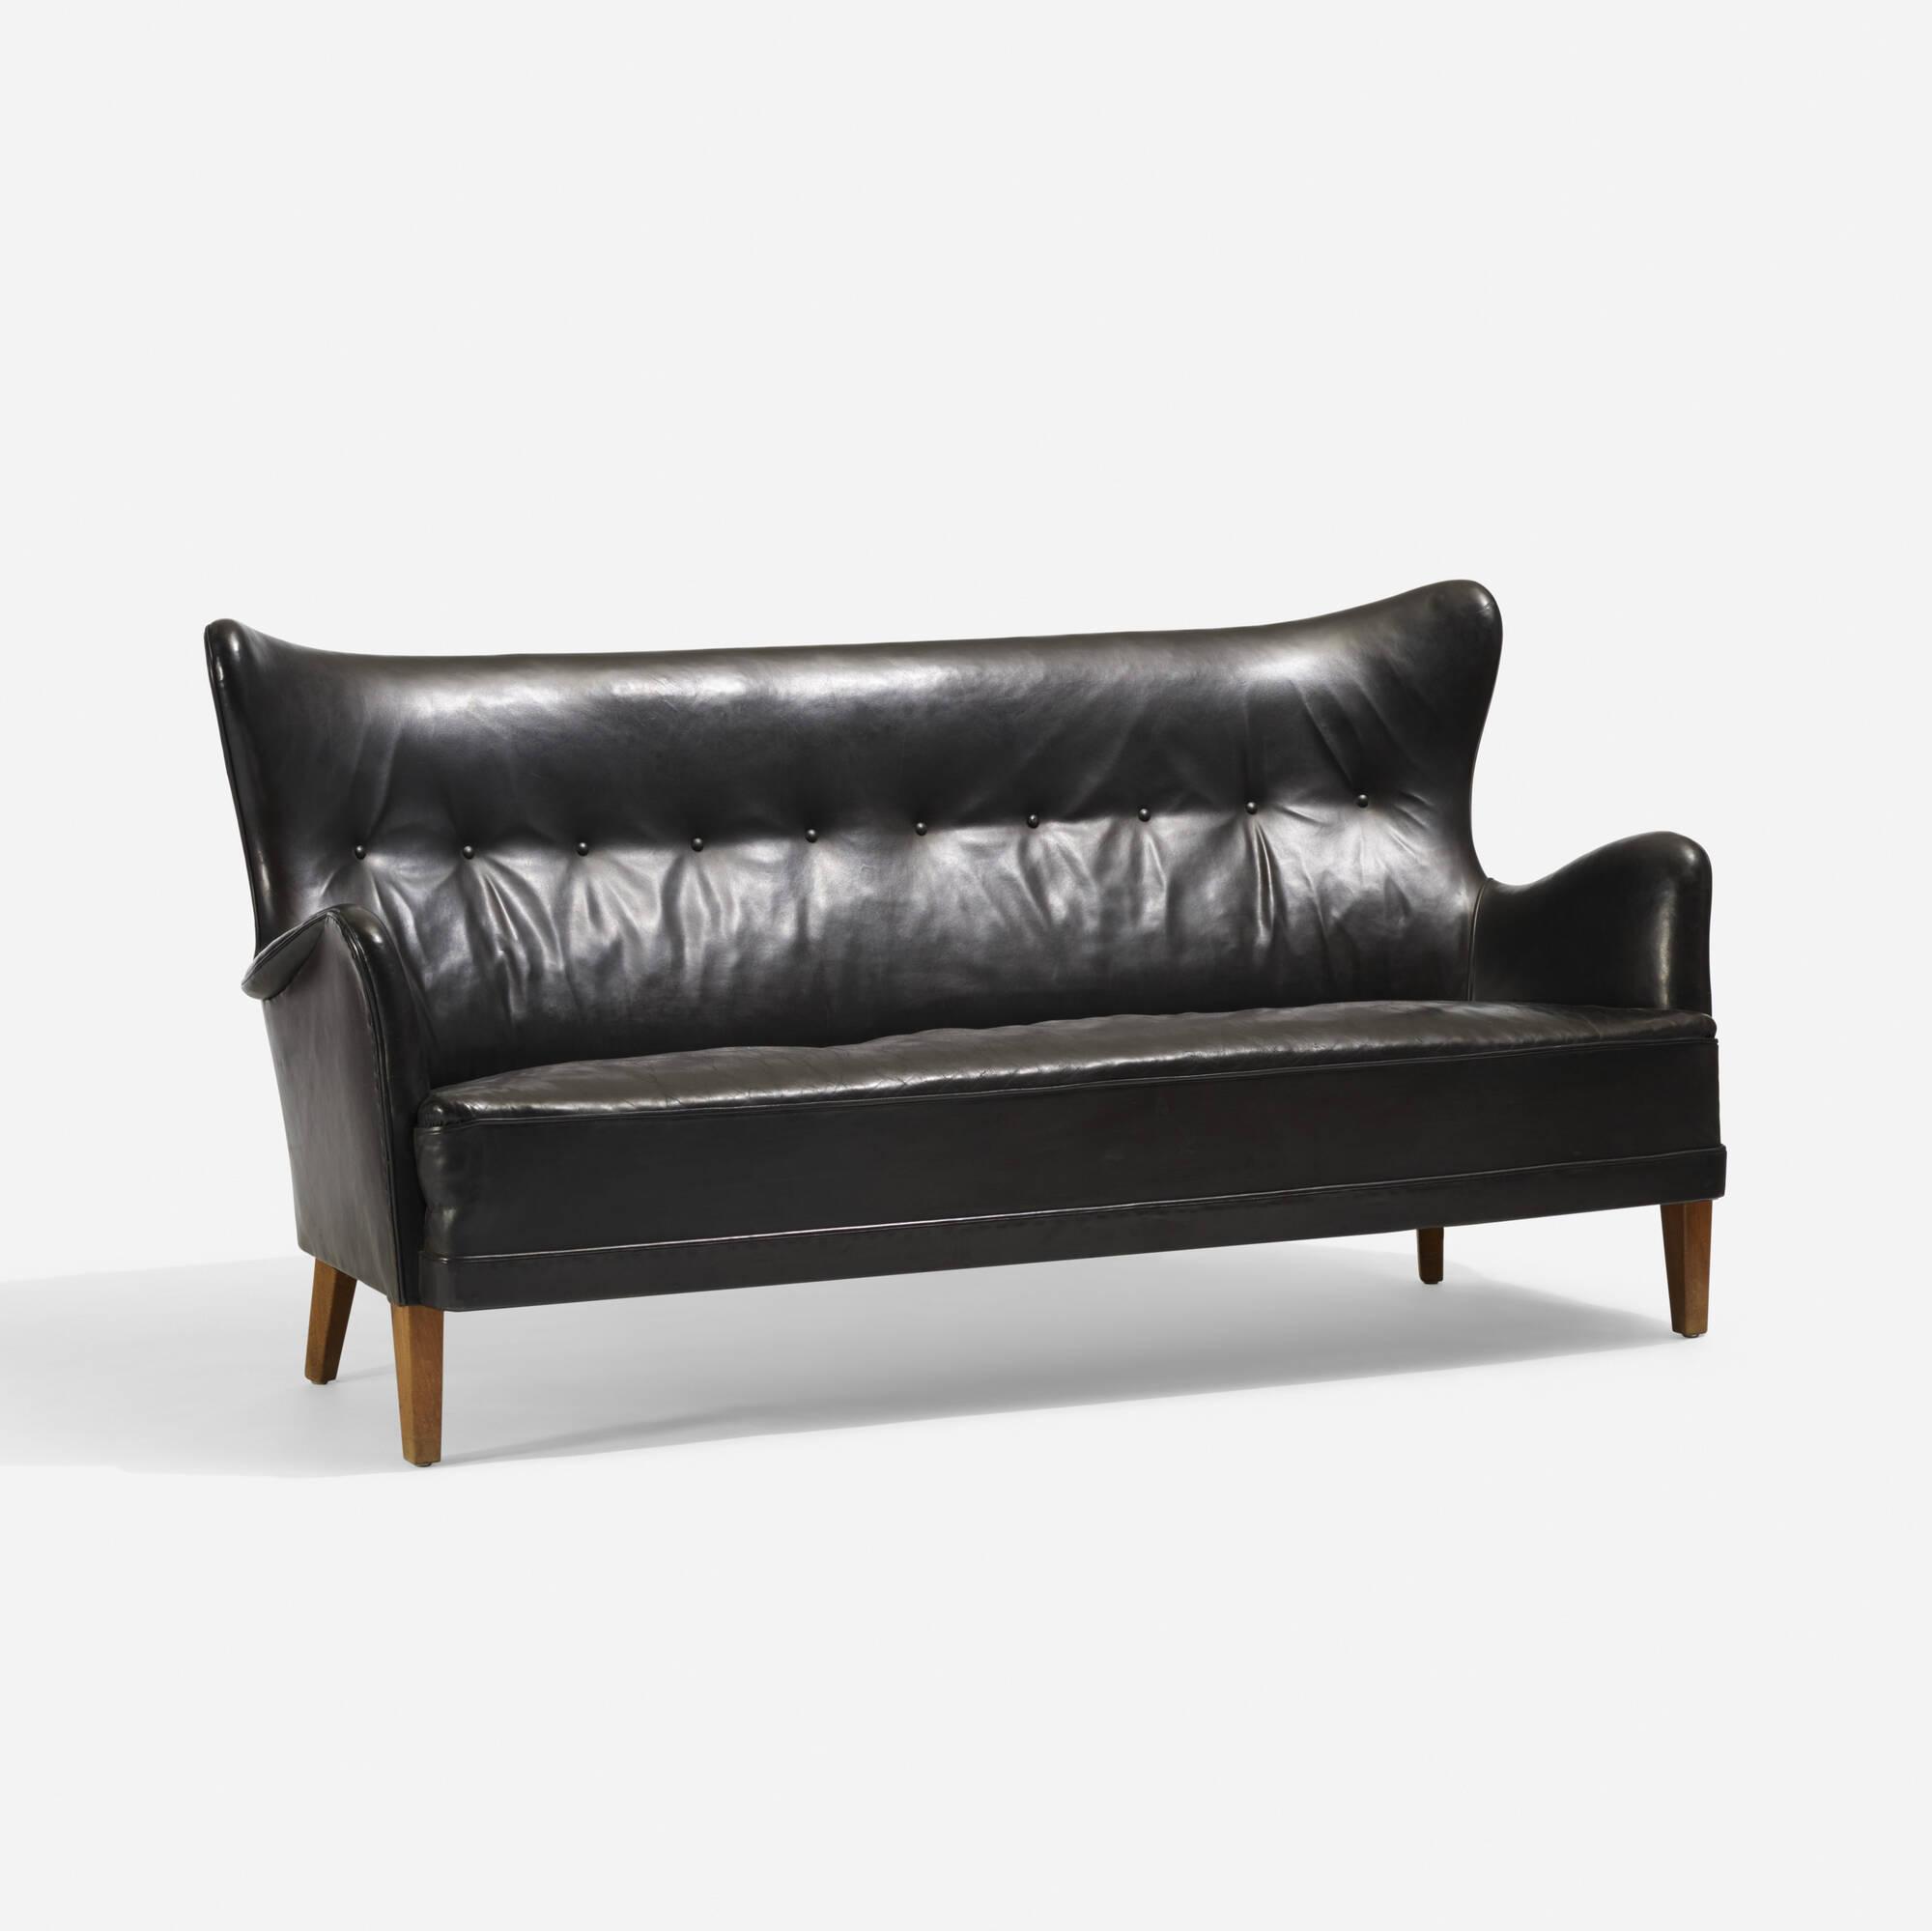 234: Frits Henningsen / sofa (1 of 3)